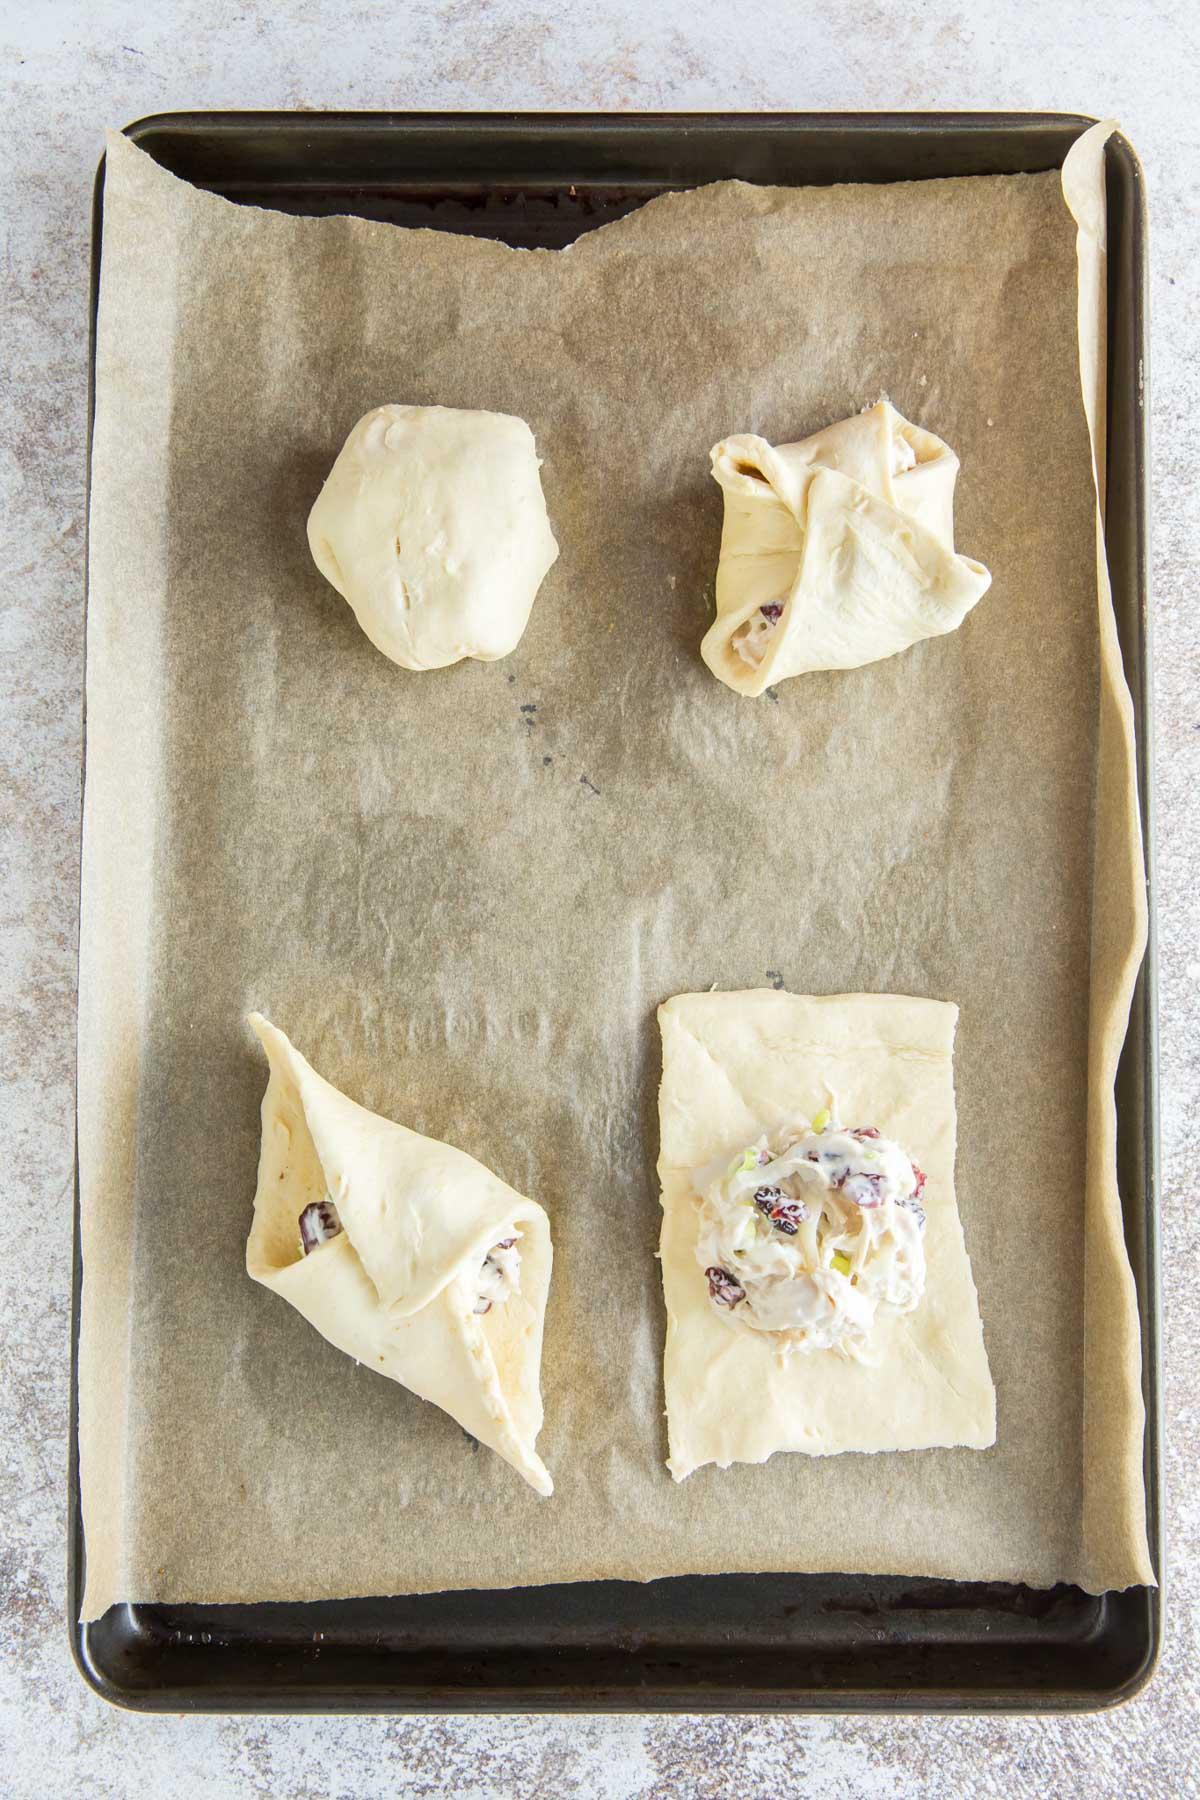 baking sheet, parchment paper, crescent roll dough, chicken salad